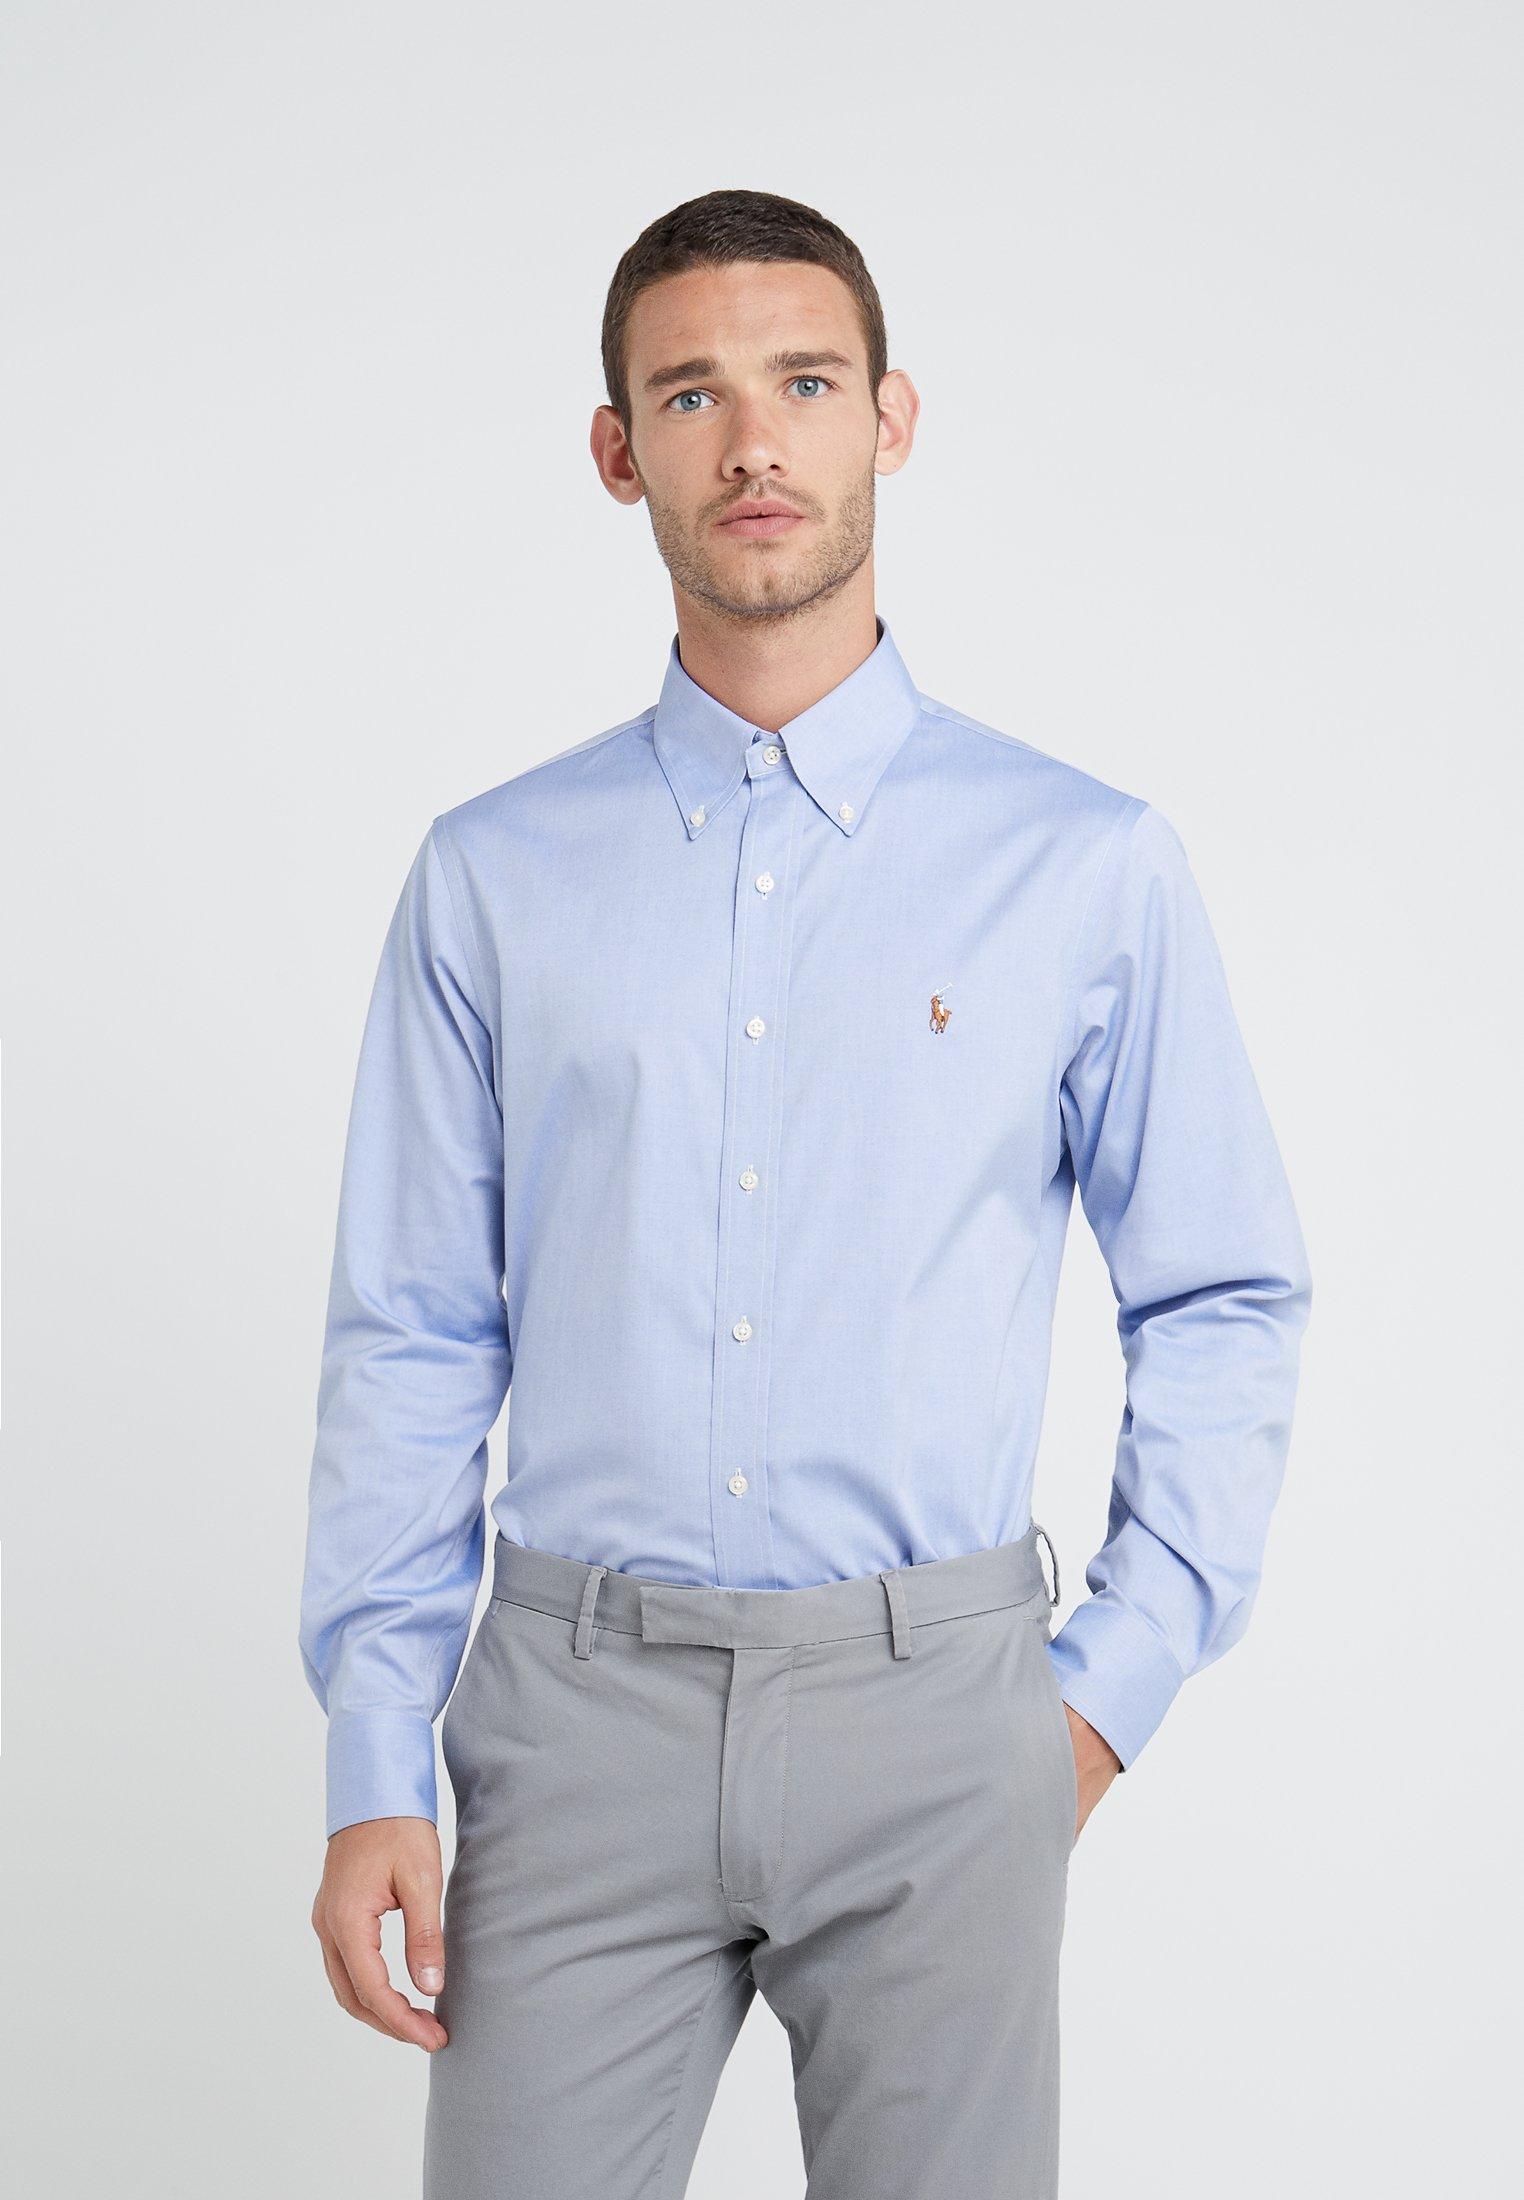 Uomo EASYCARE PINPOINT OXFORD CUSTOM FIT - Camicia